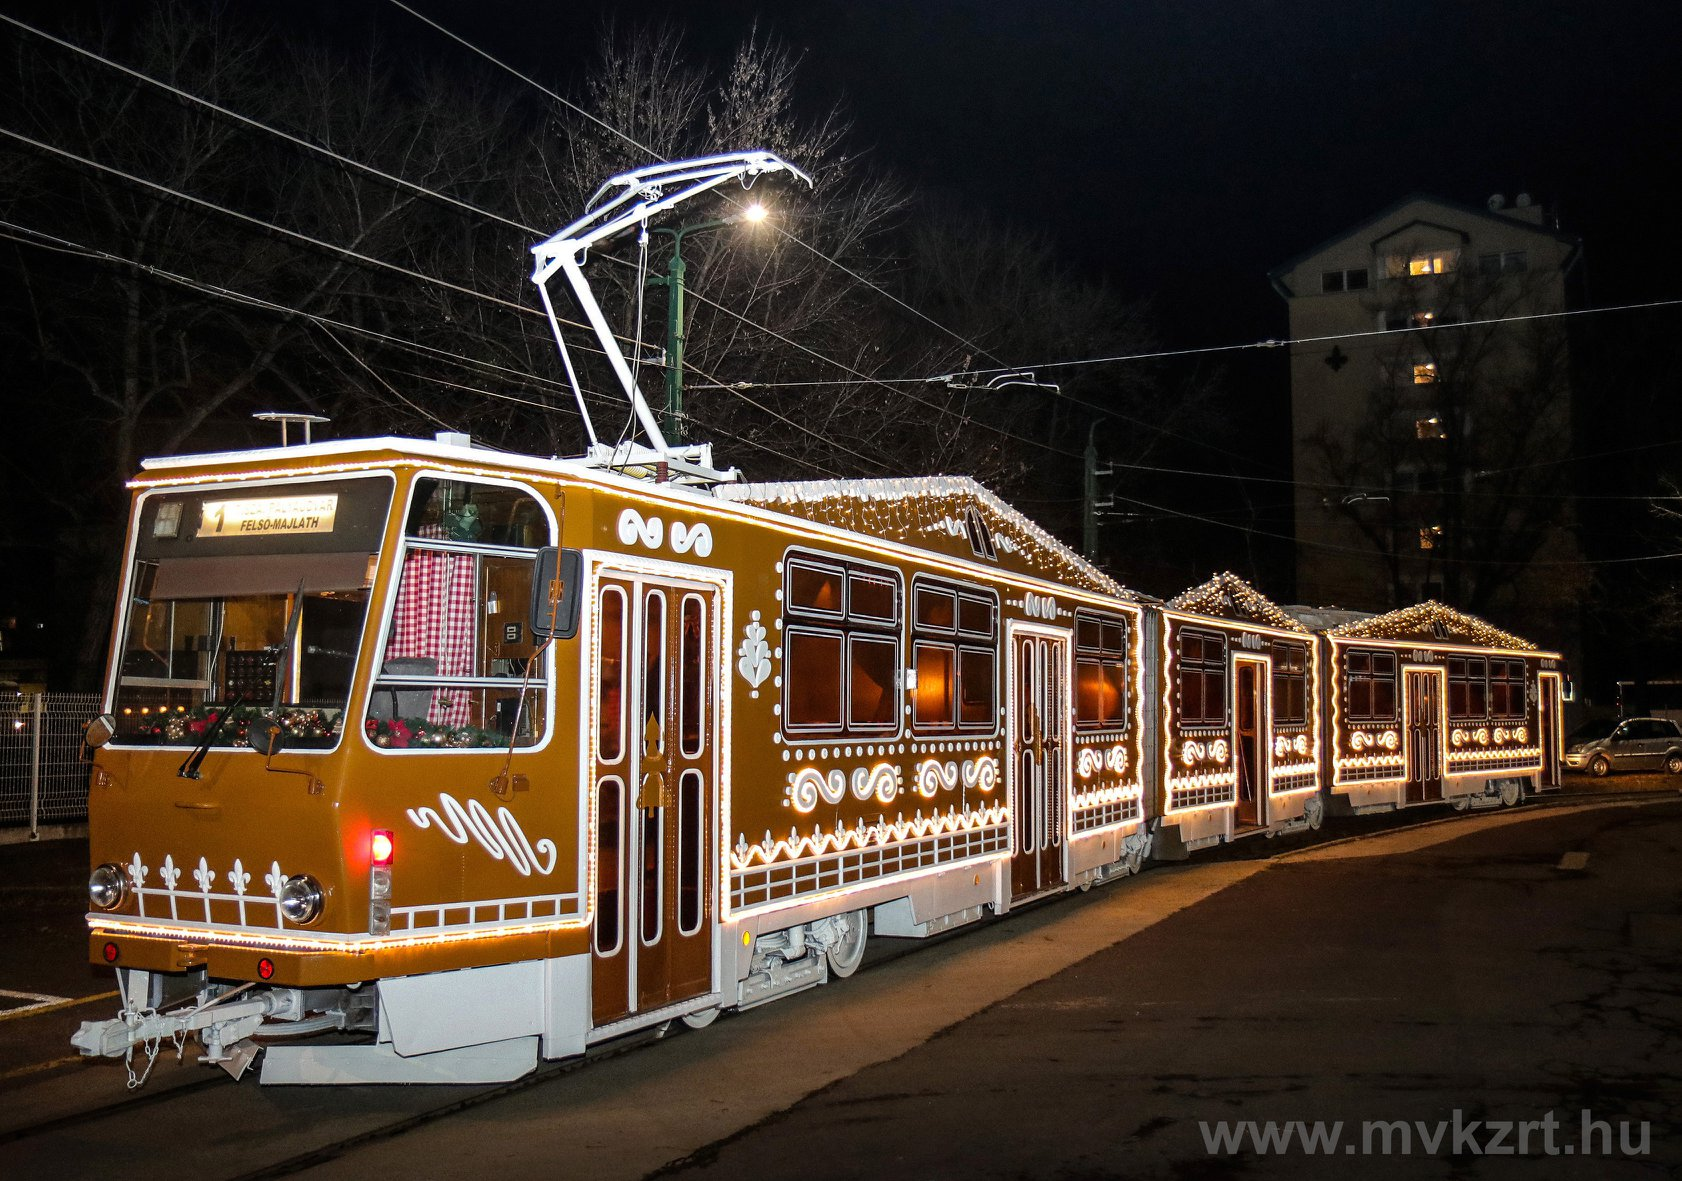 advent, tram, Hungary, Miskolc